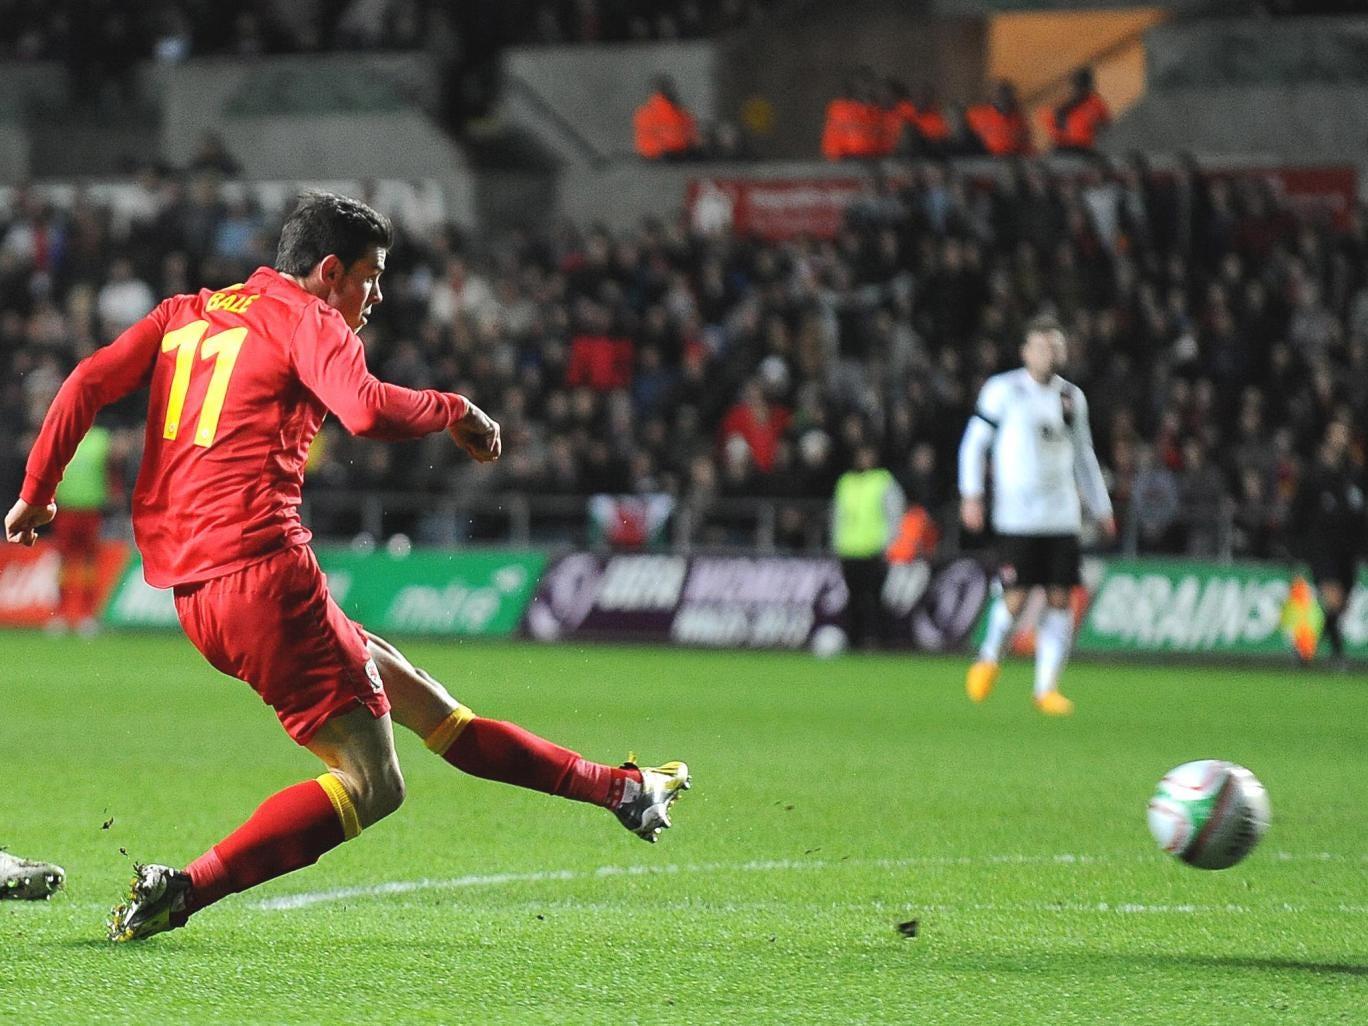 Gareth Bale opens the scoring in Swansea